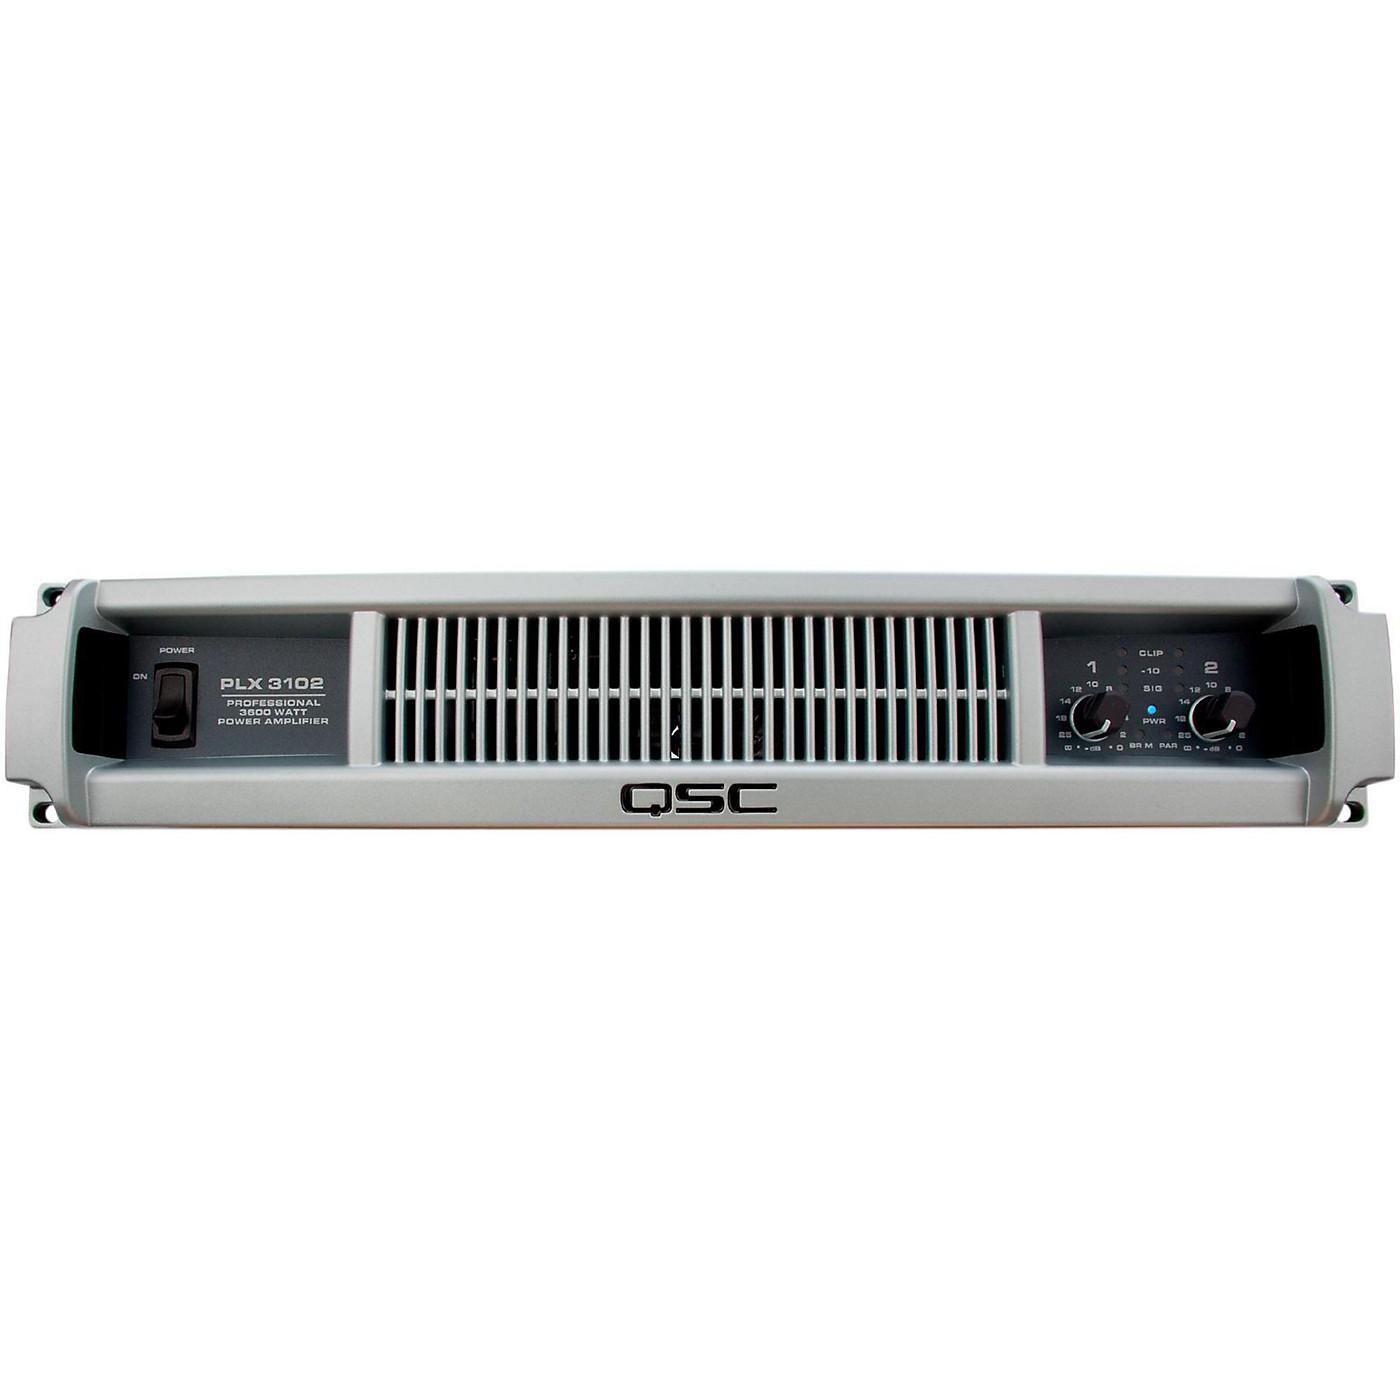 QSC PLX3102 Professional Power Amplifier thumbnail